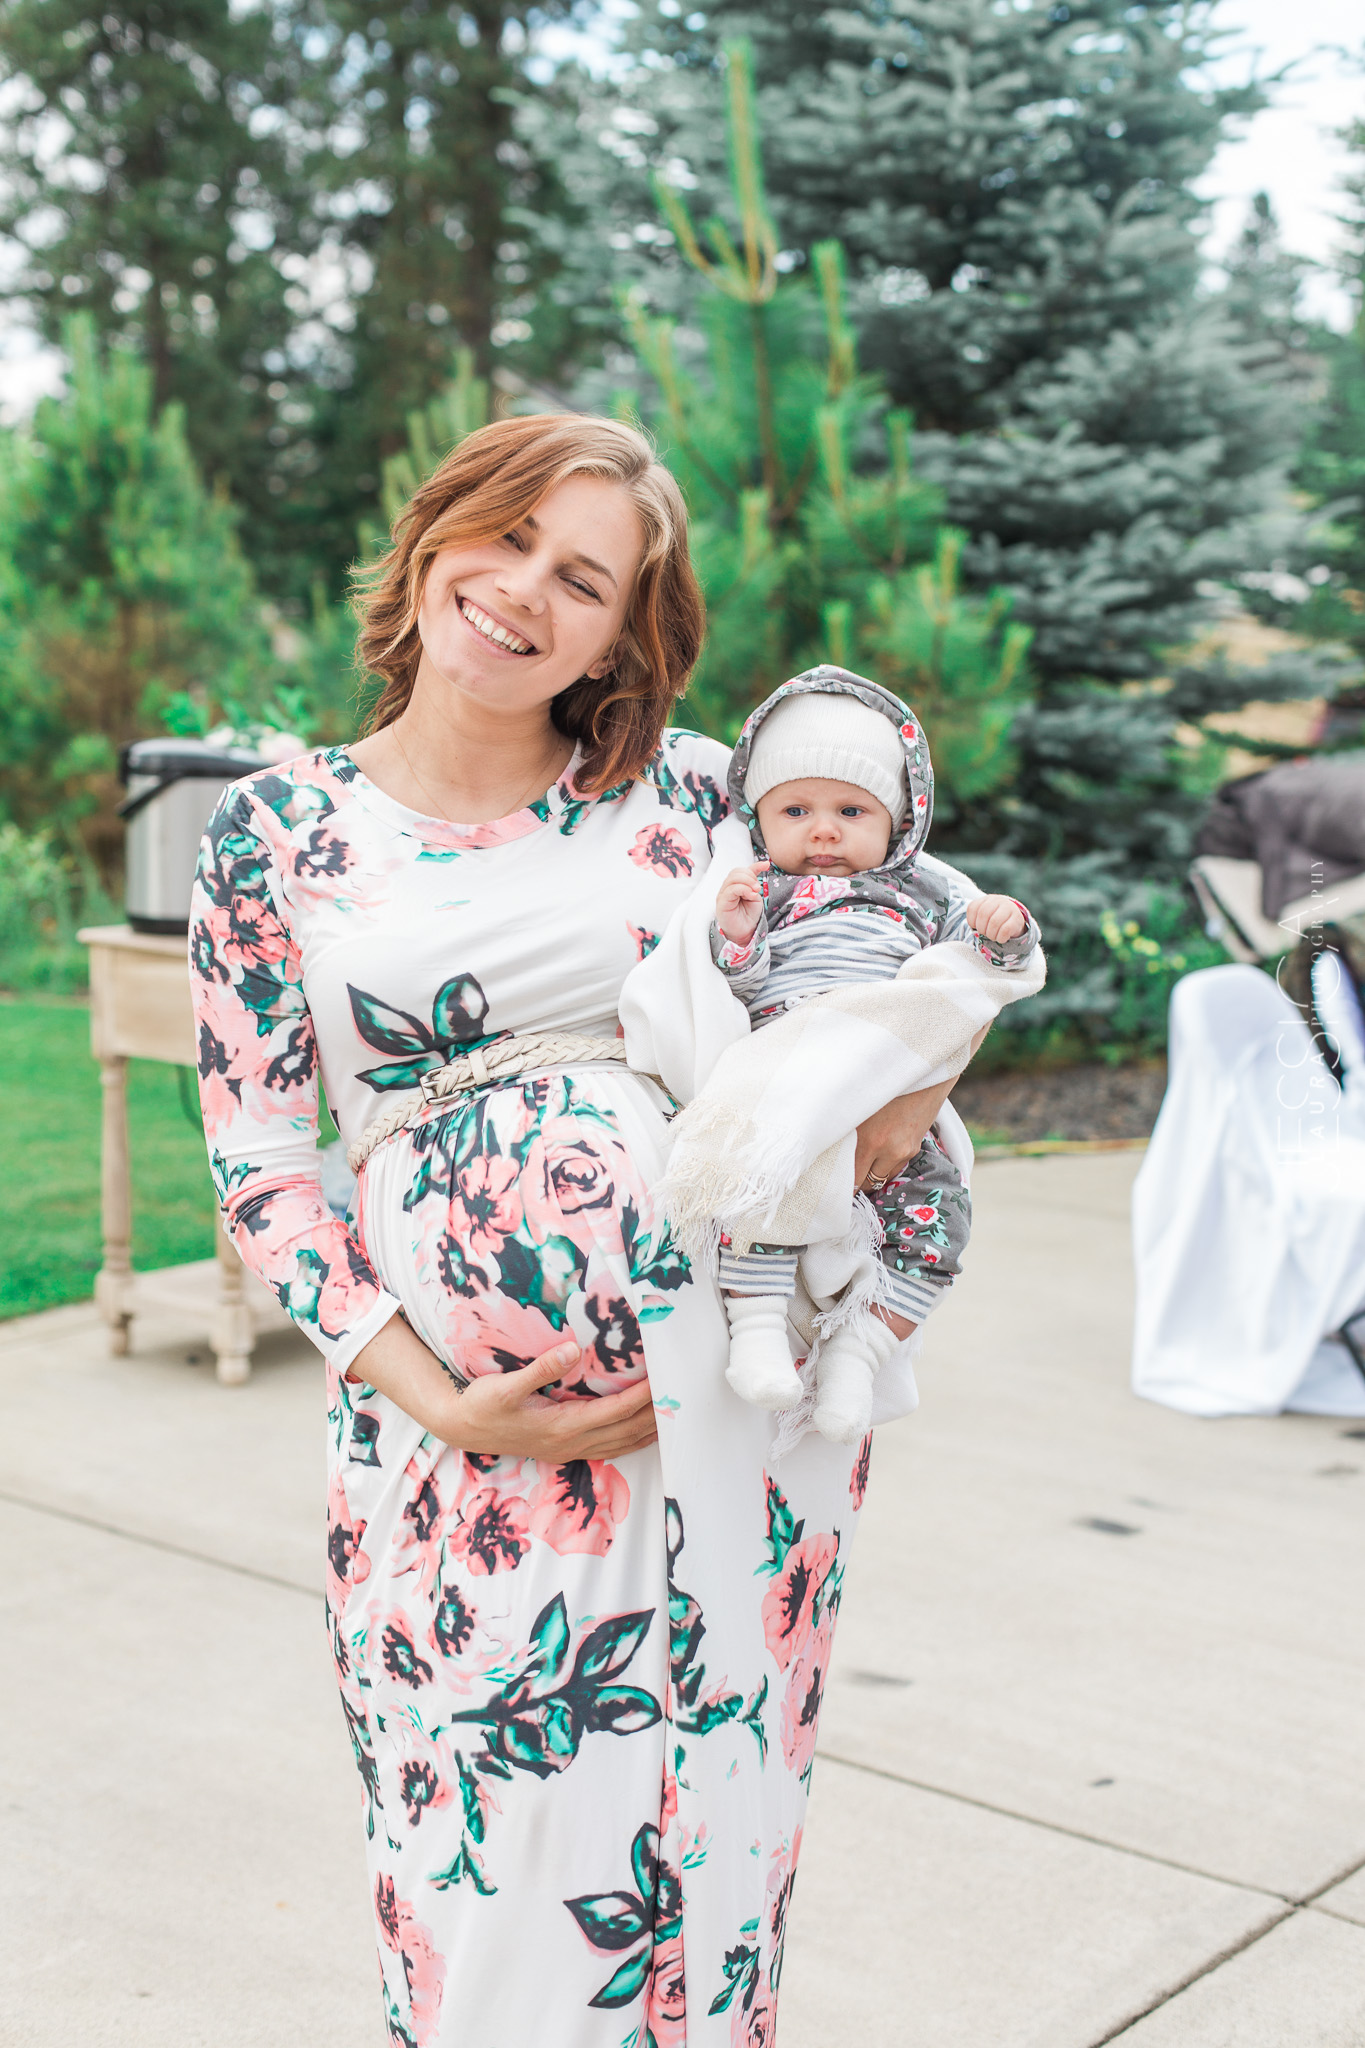 NadiaK-WEBSIZE-babyshower (23 of 45).jpg